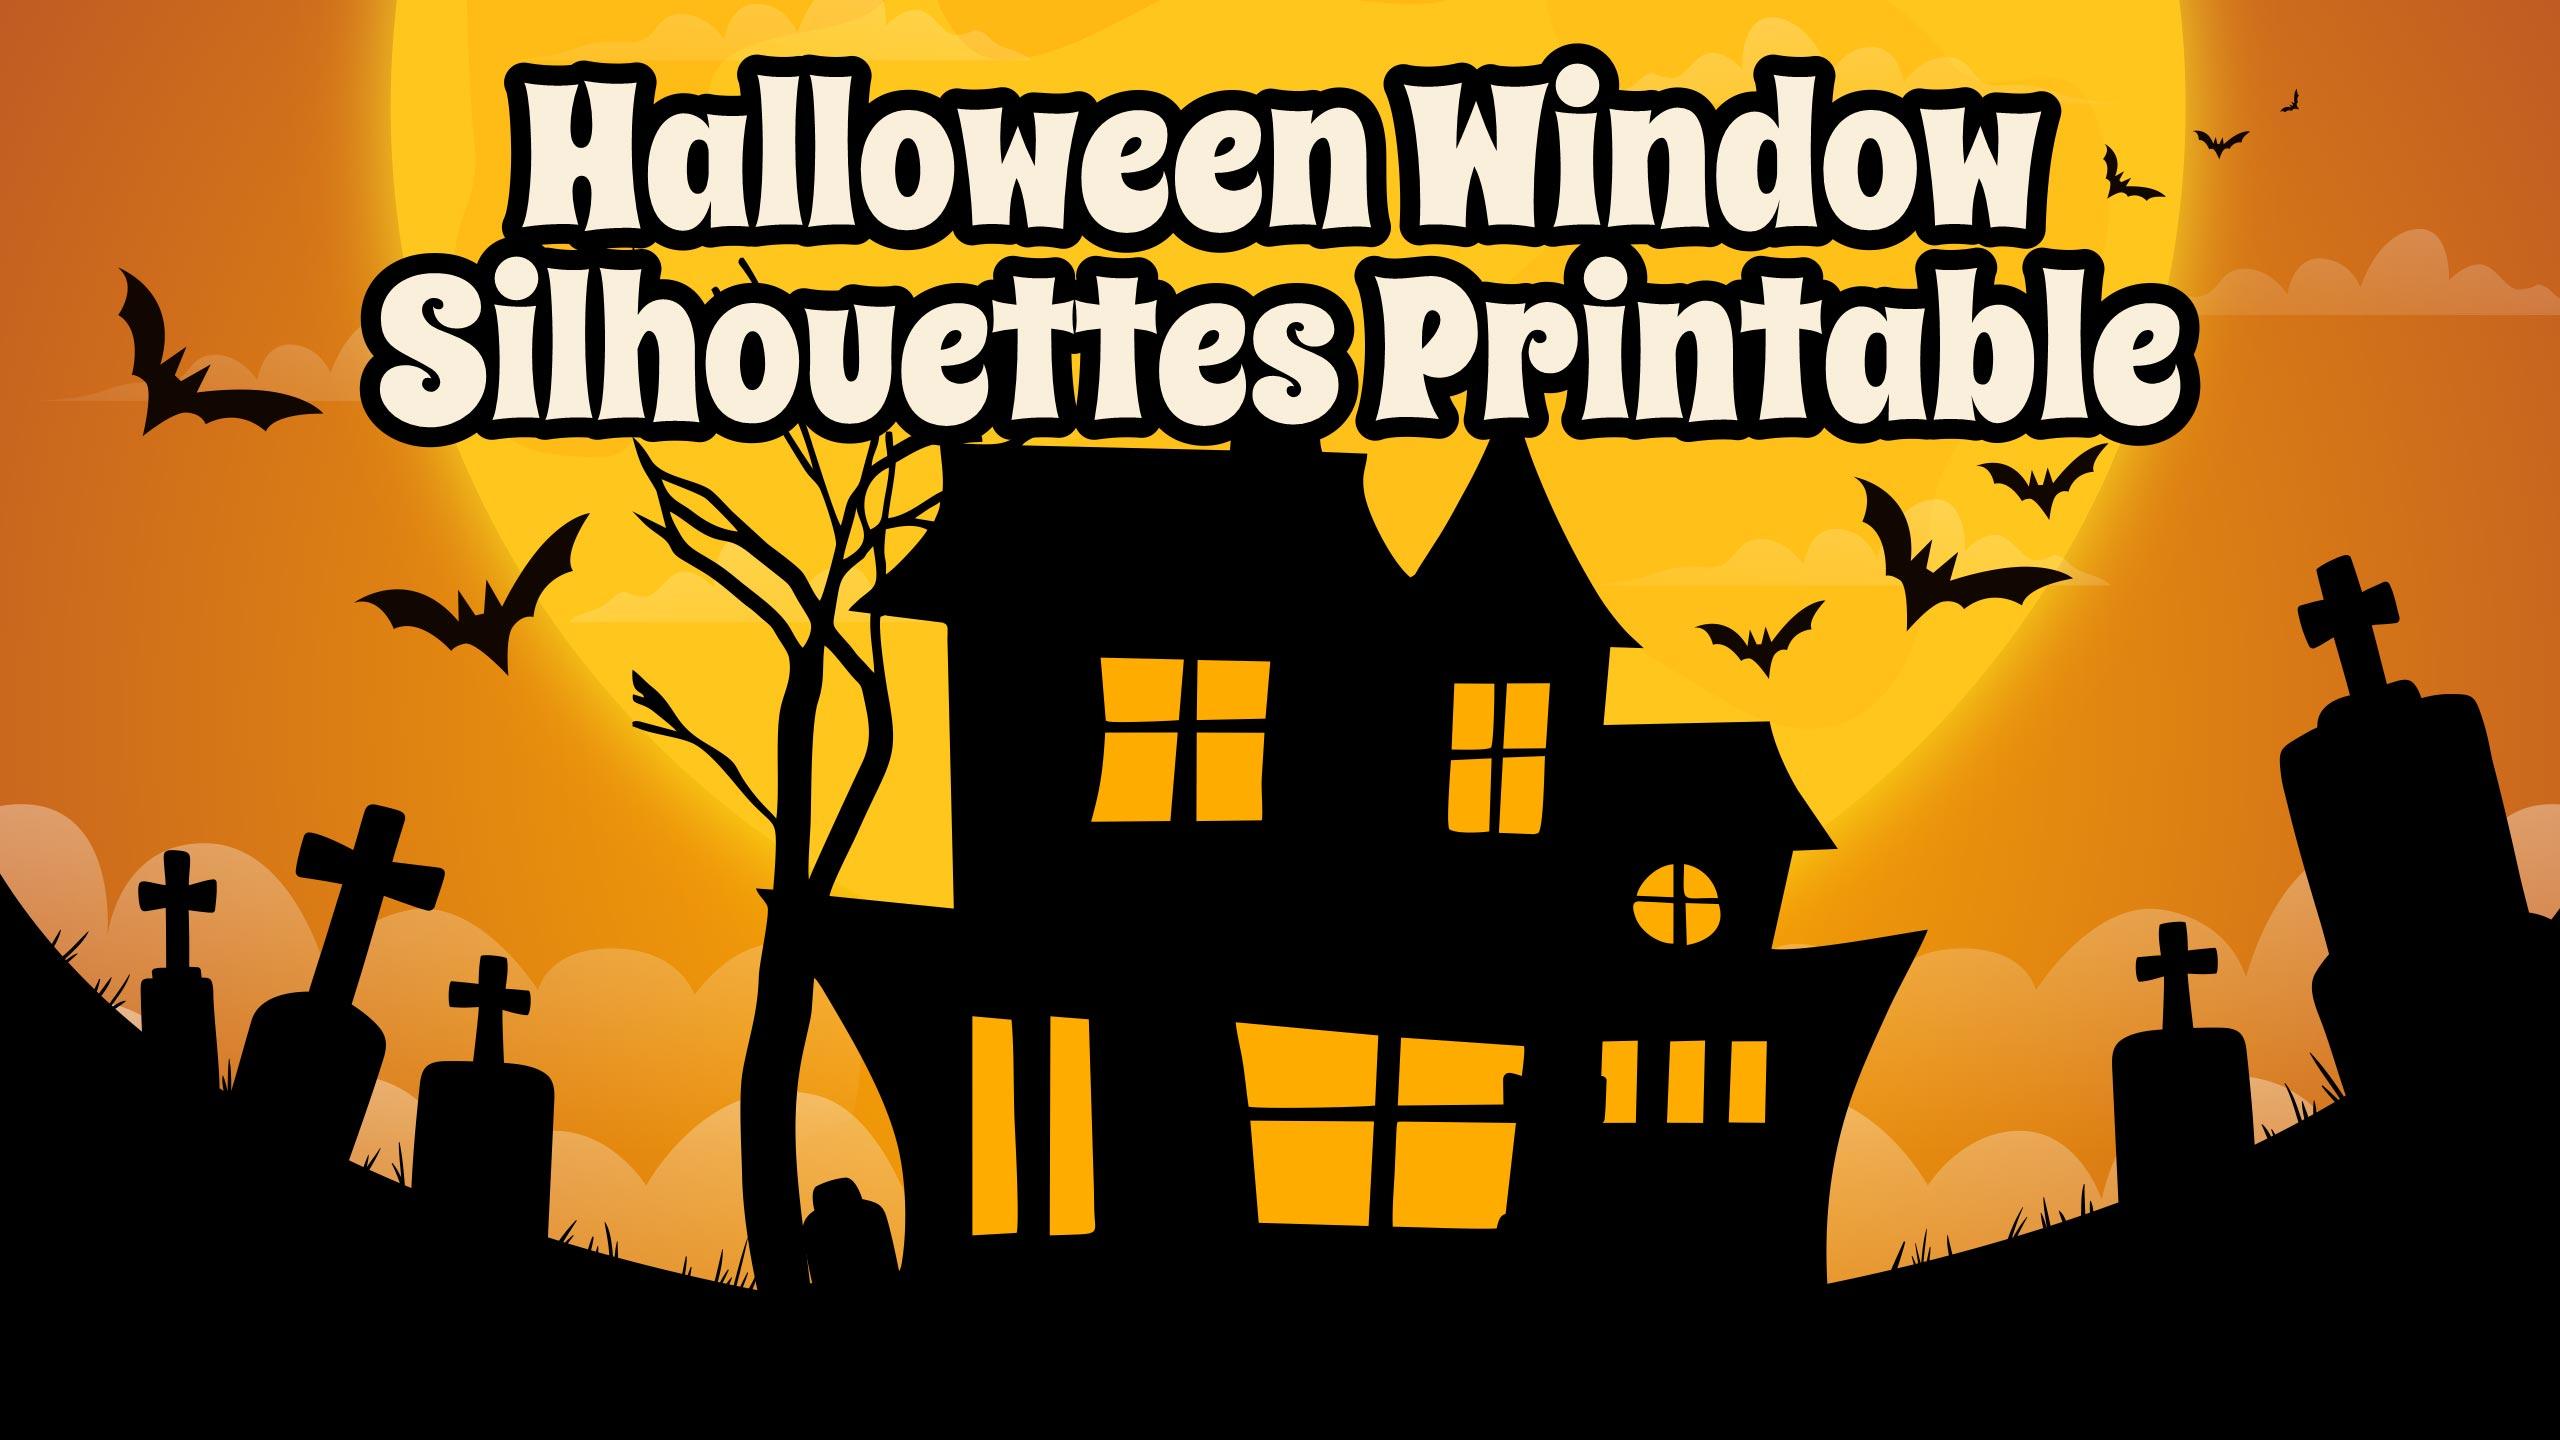 Halloween Window Silhouettes Printable